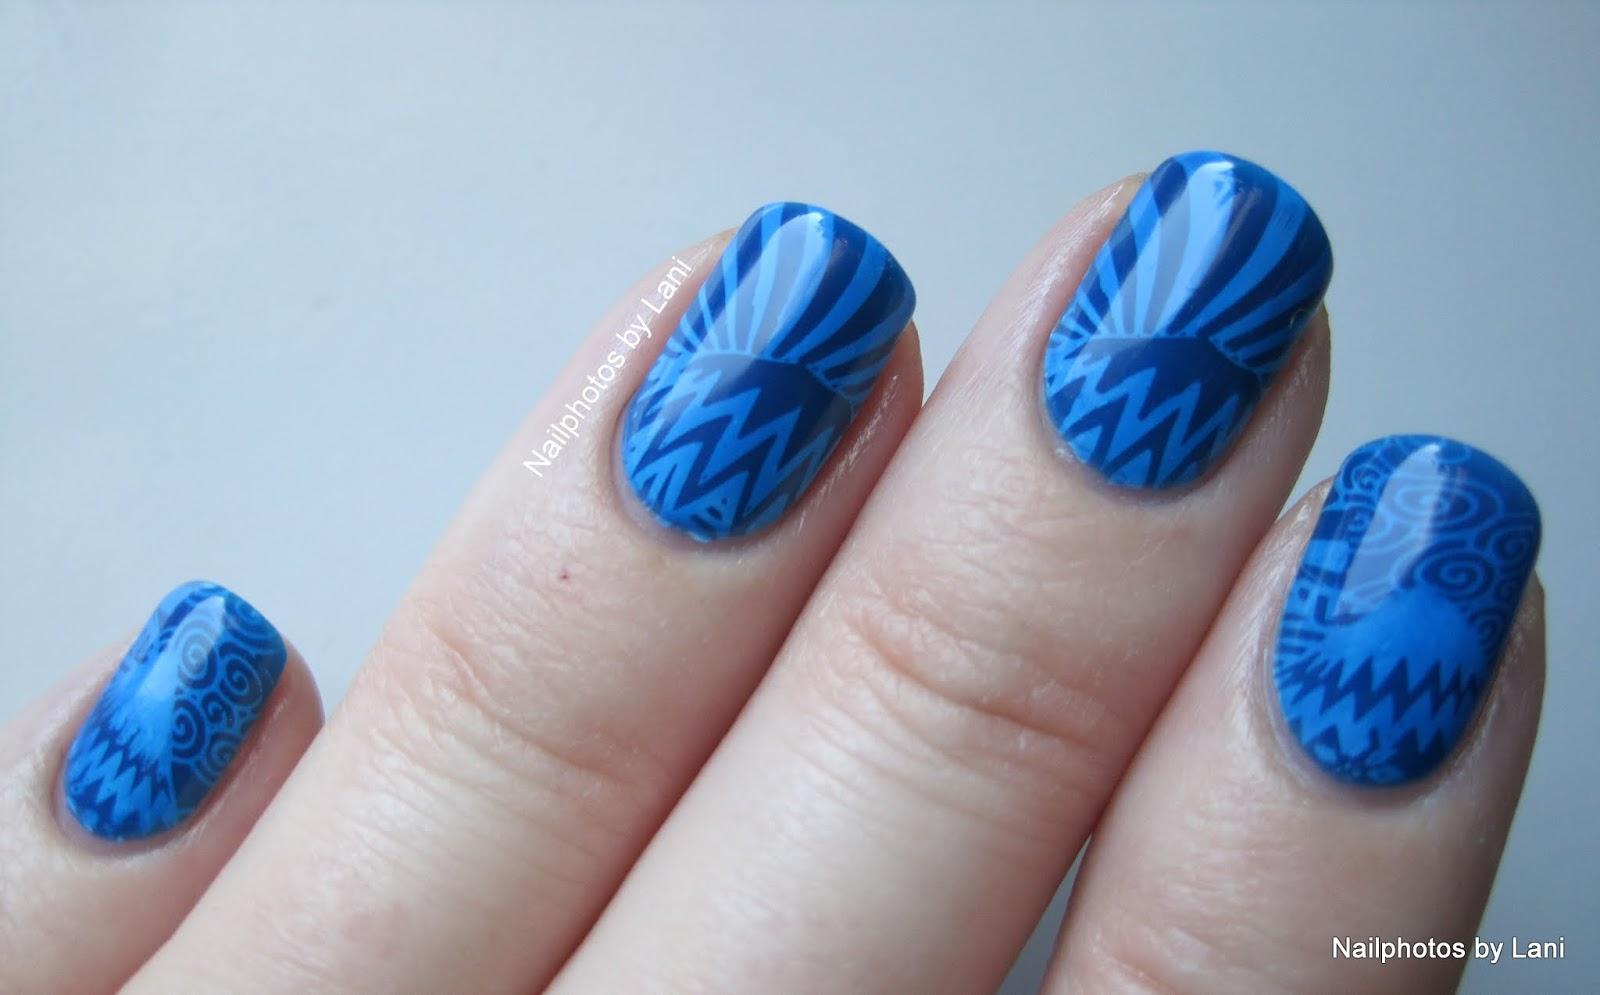 Nailphotos by Lani: Norway Nails Nail Art Diabetes Awareness Contest ...